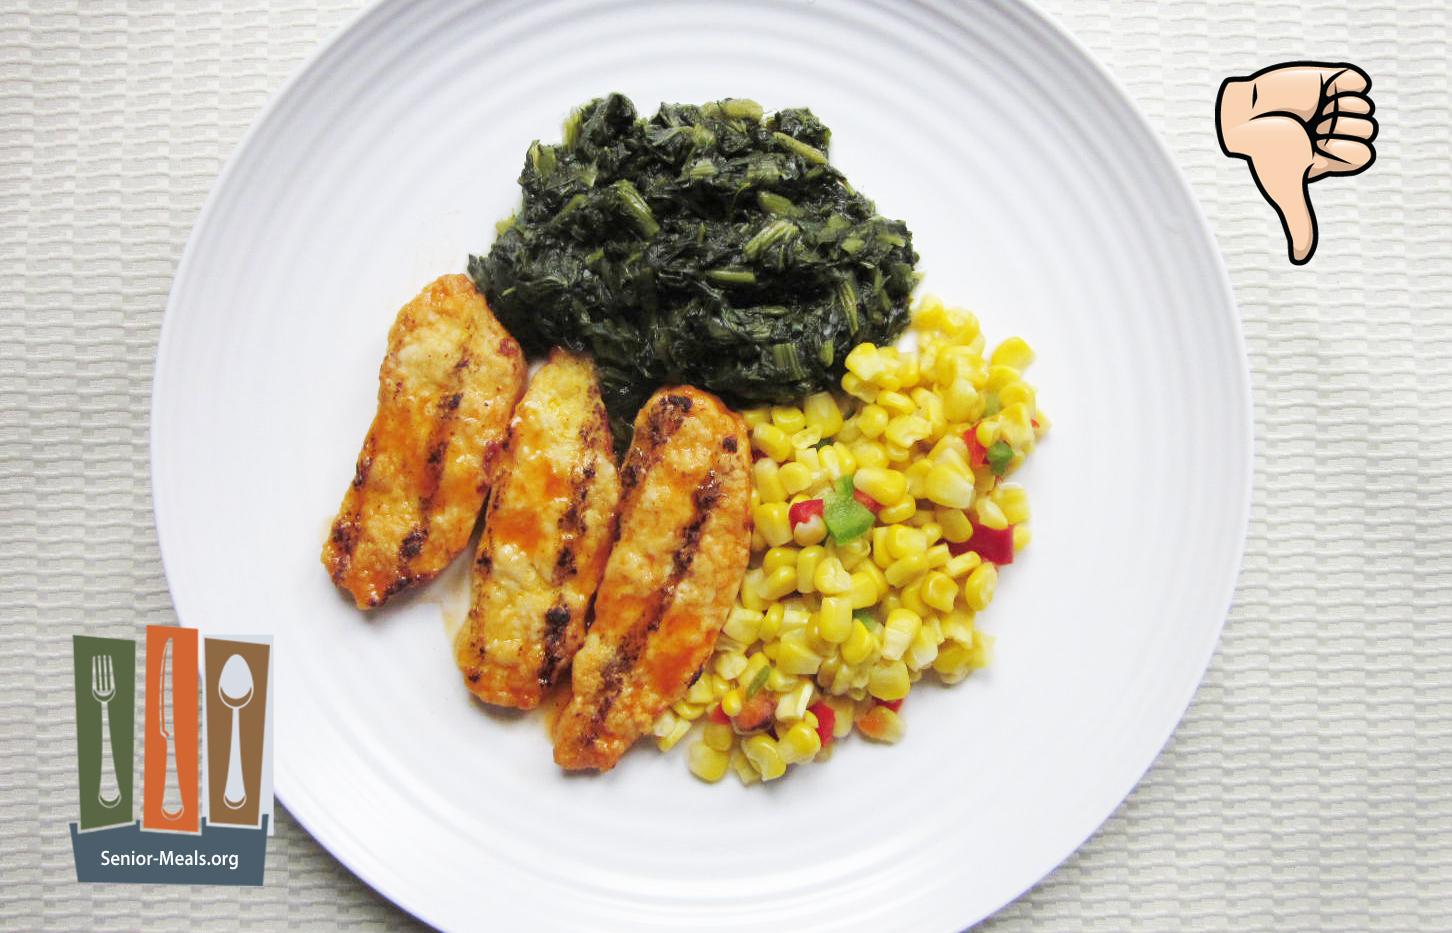 Humana Well Dine Senior Meals Food Assistance Program